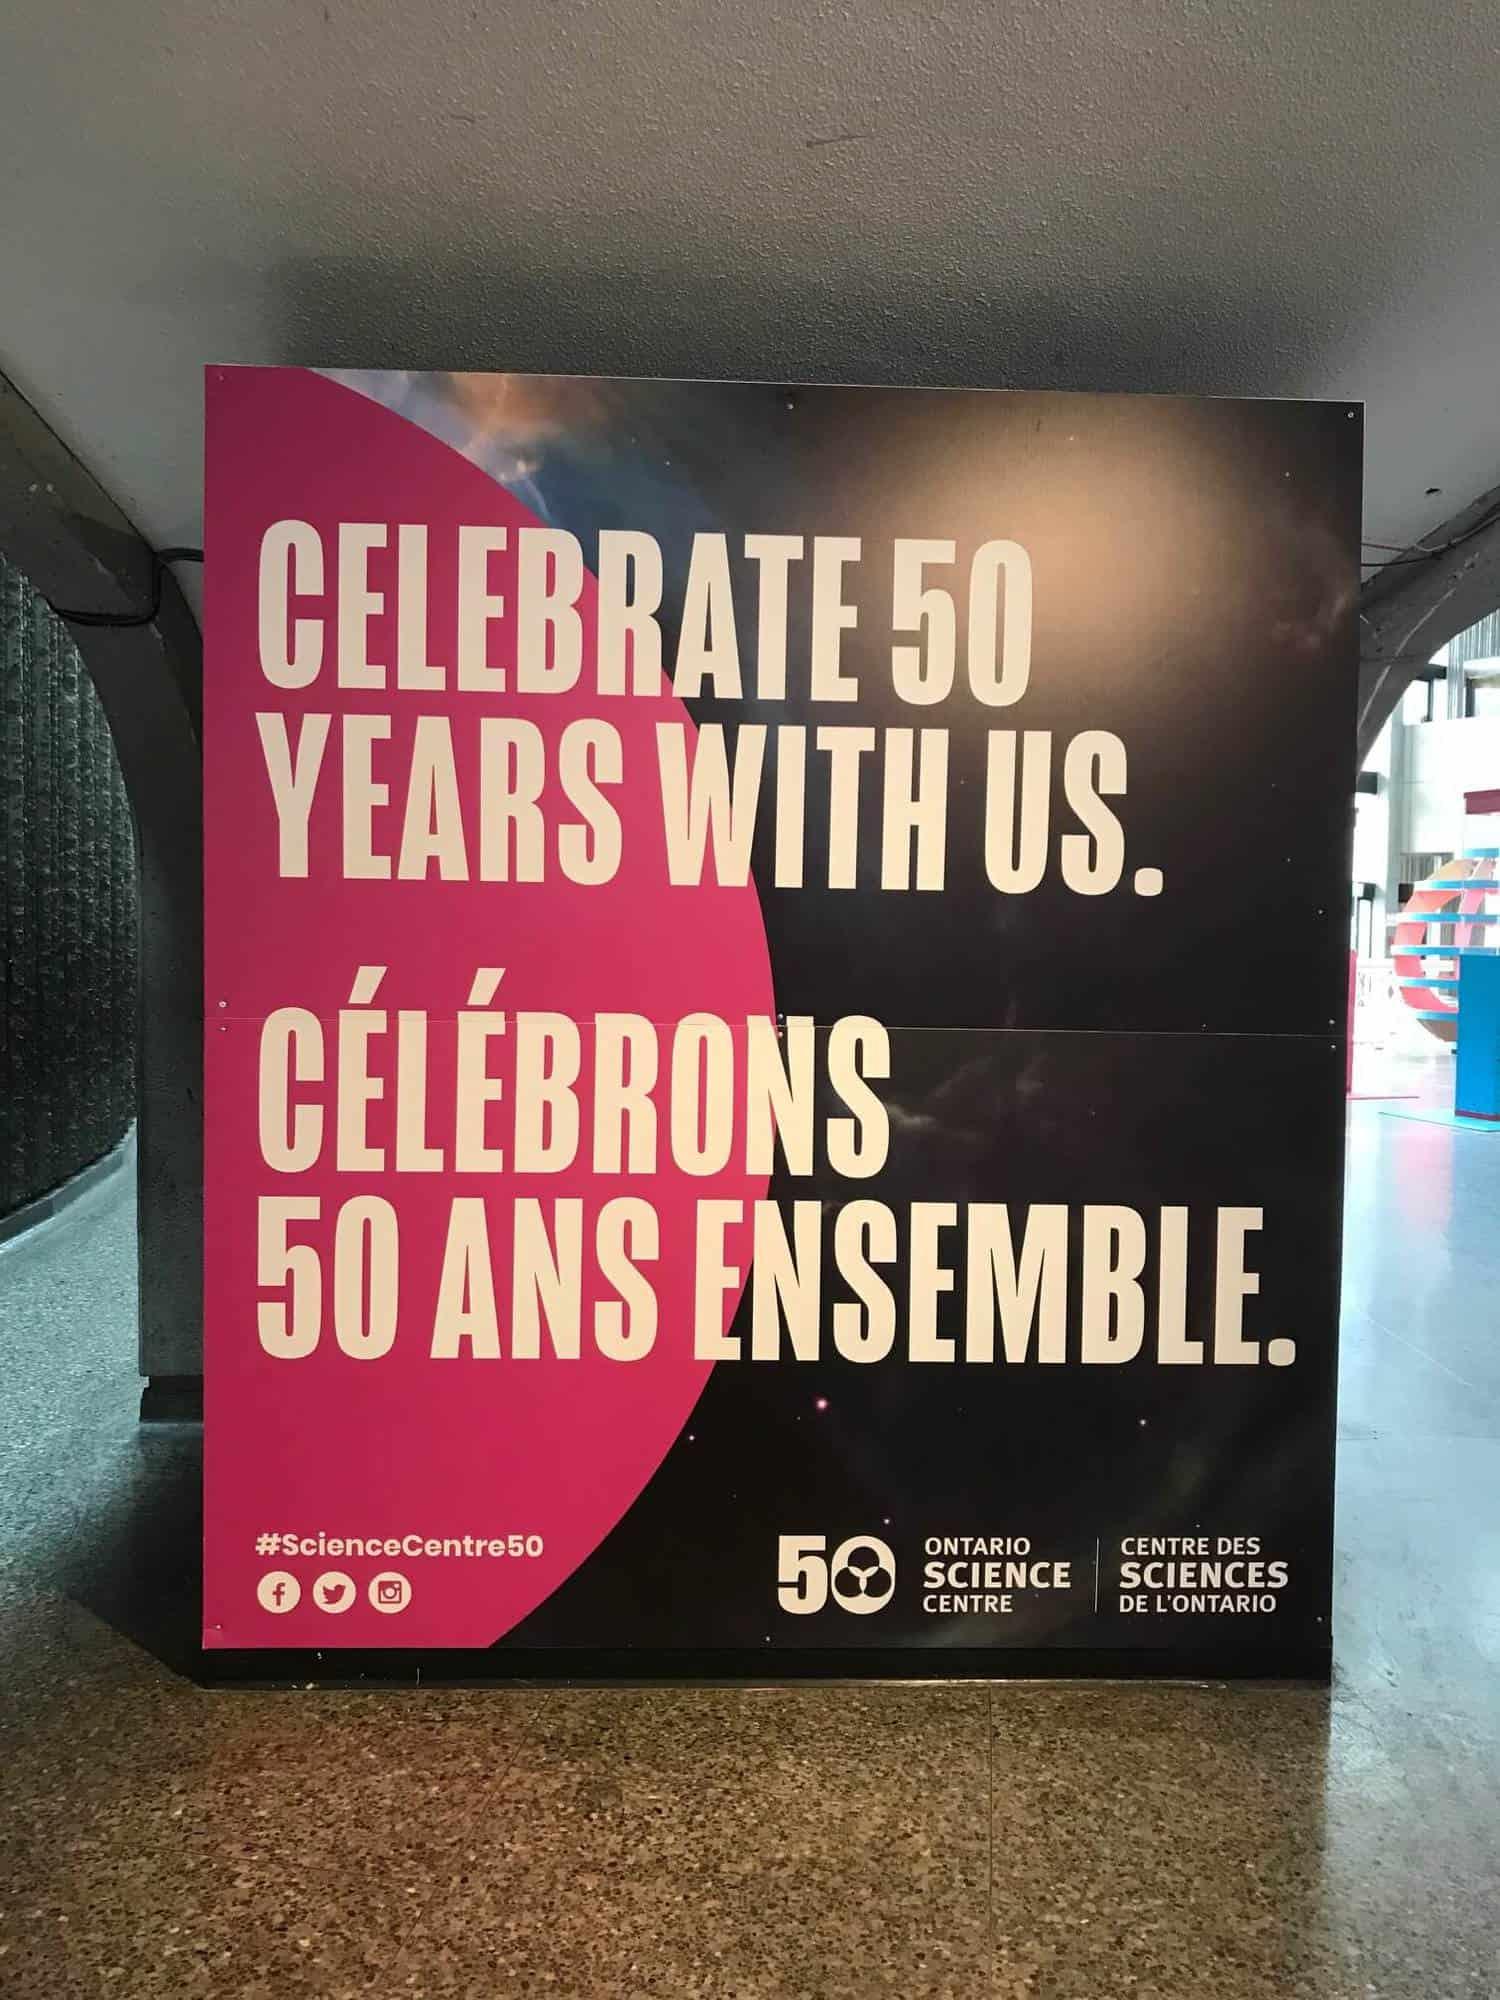 Ontario Science Centre 50 Years